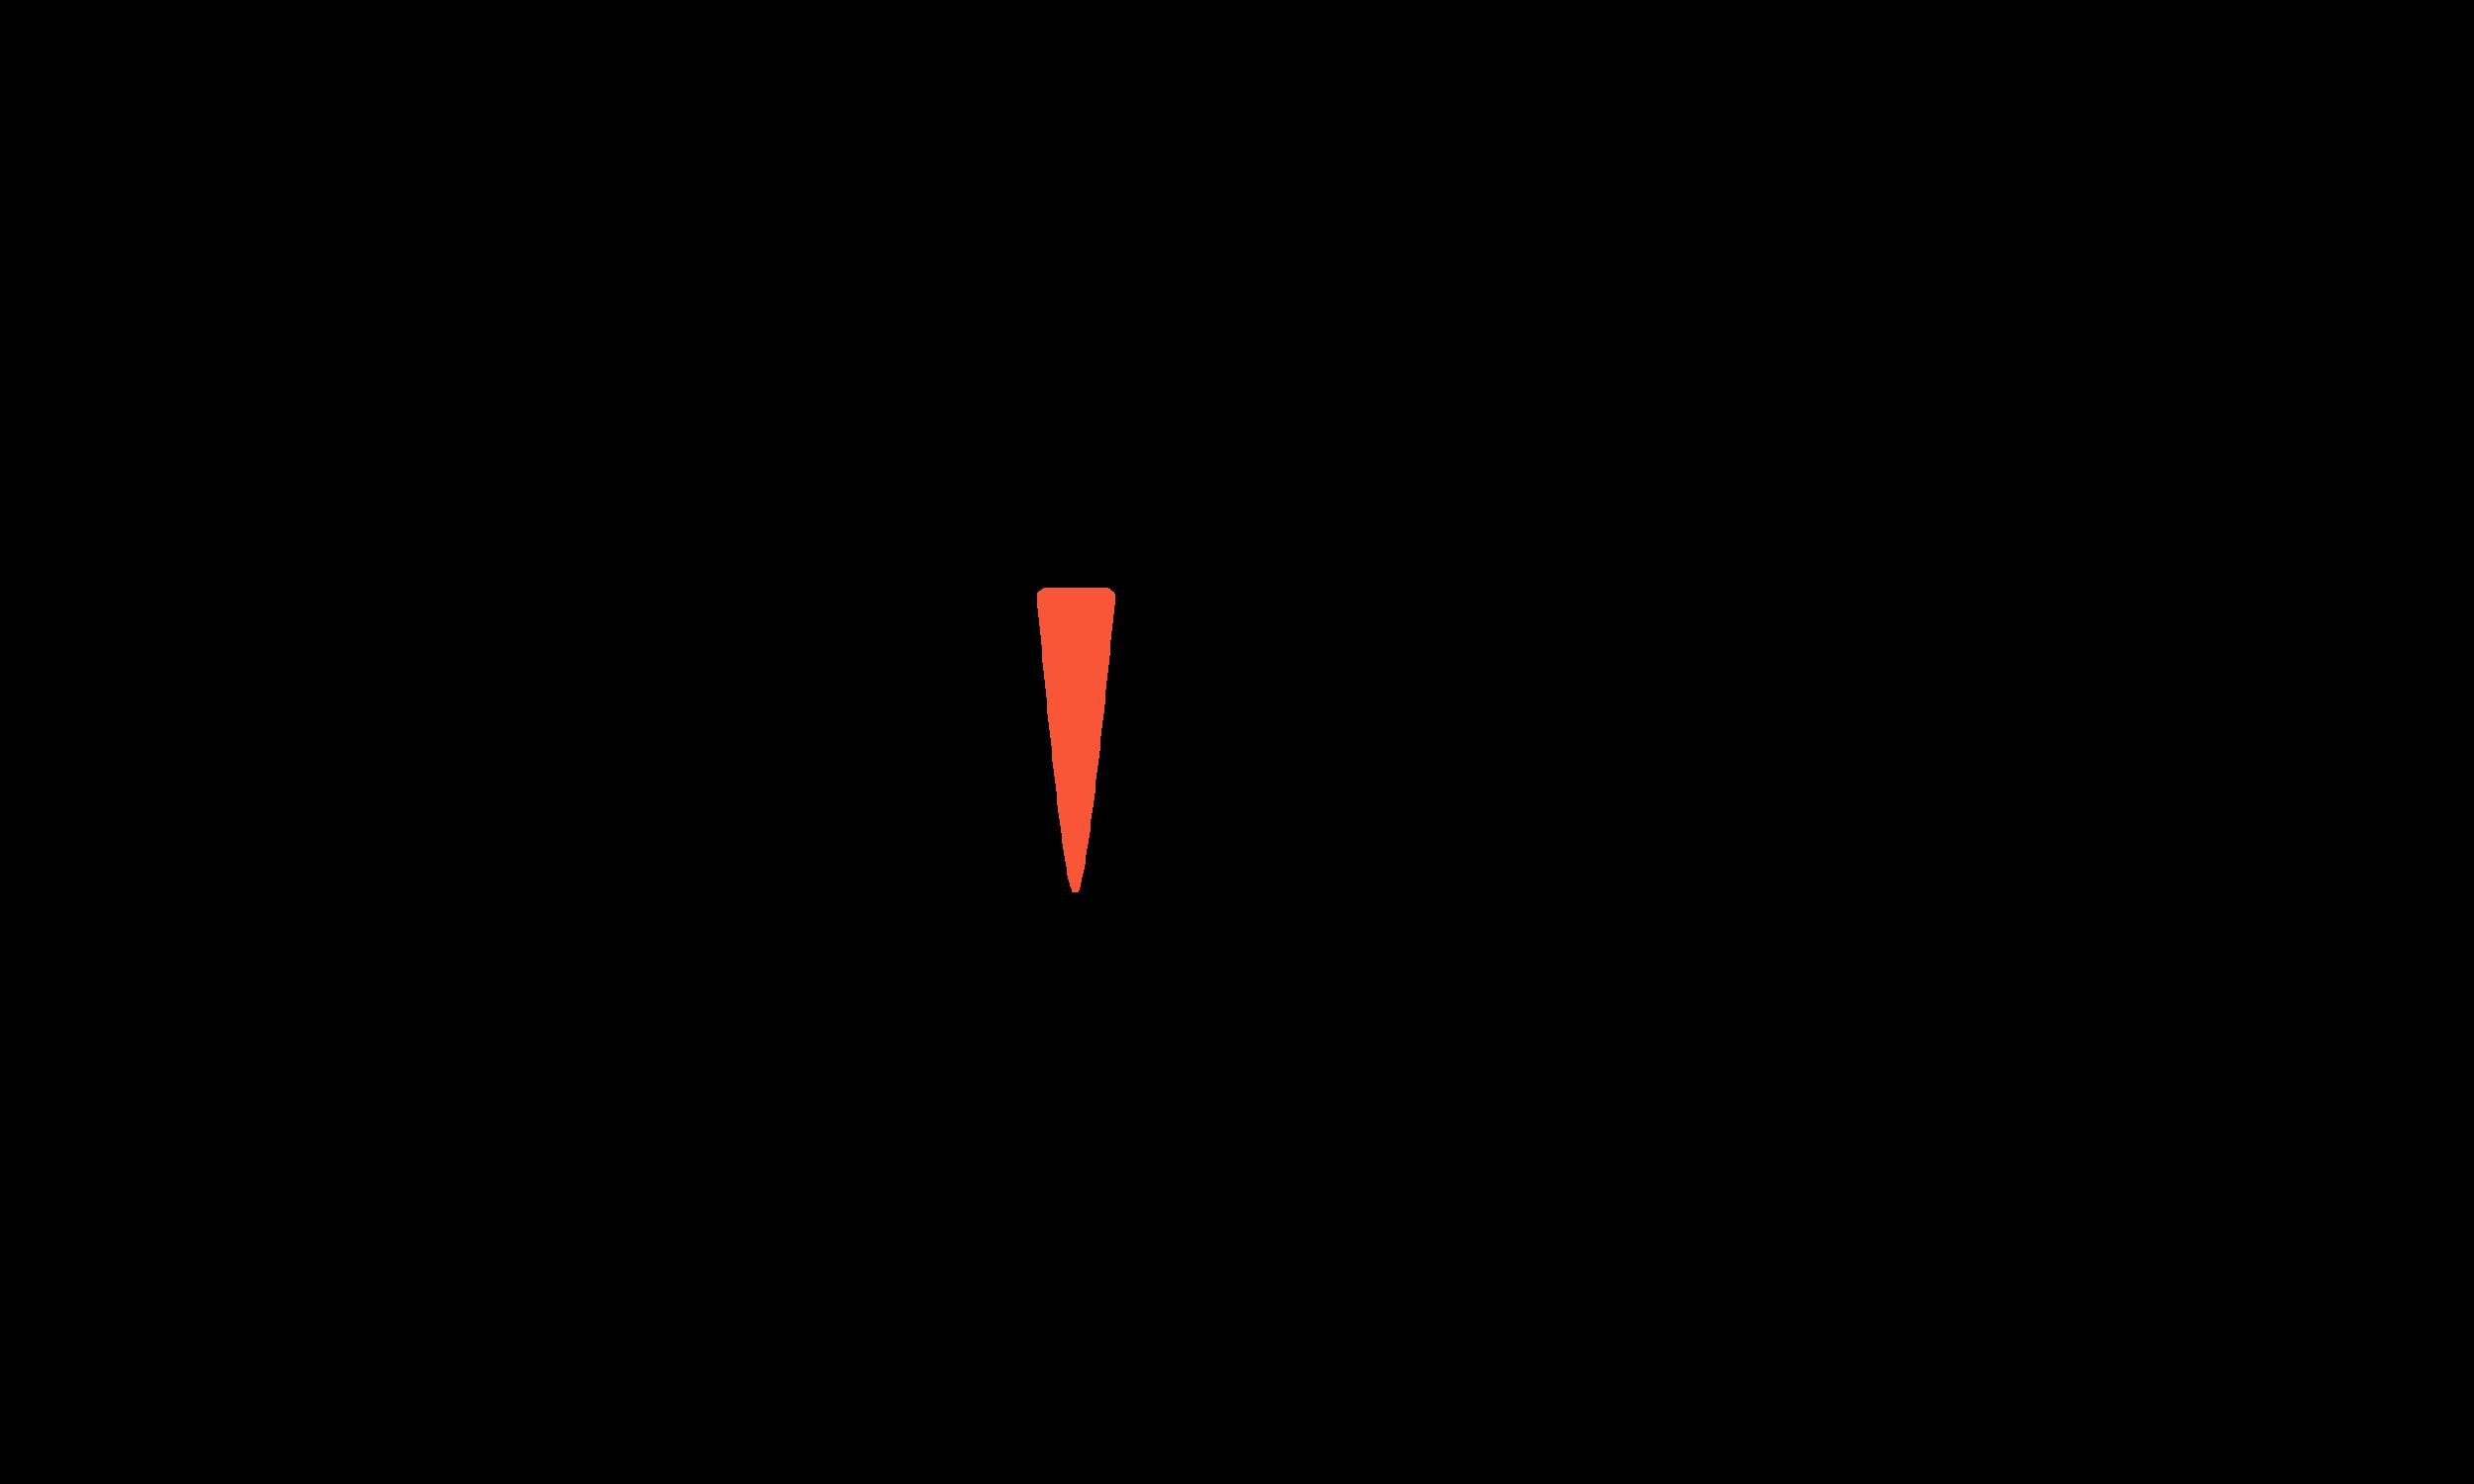 splinter-logo-3000.png